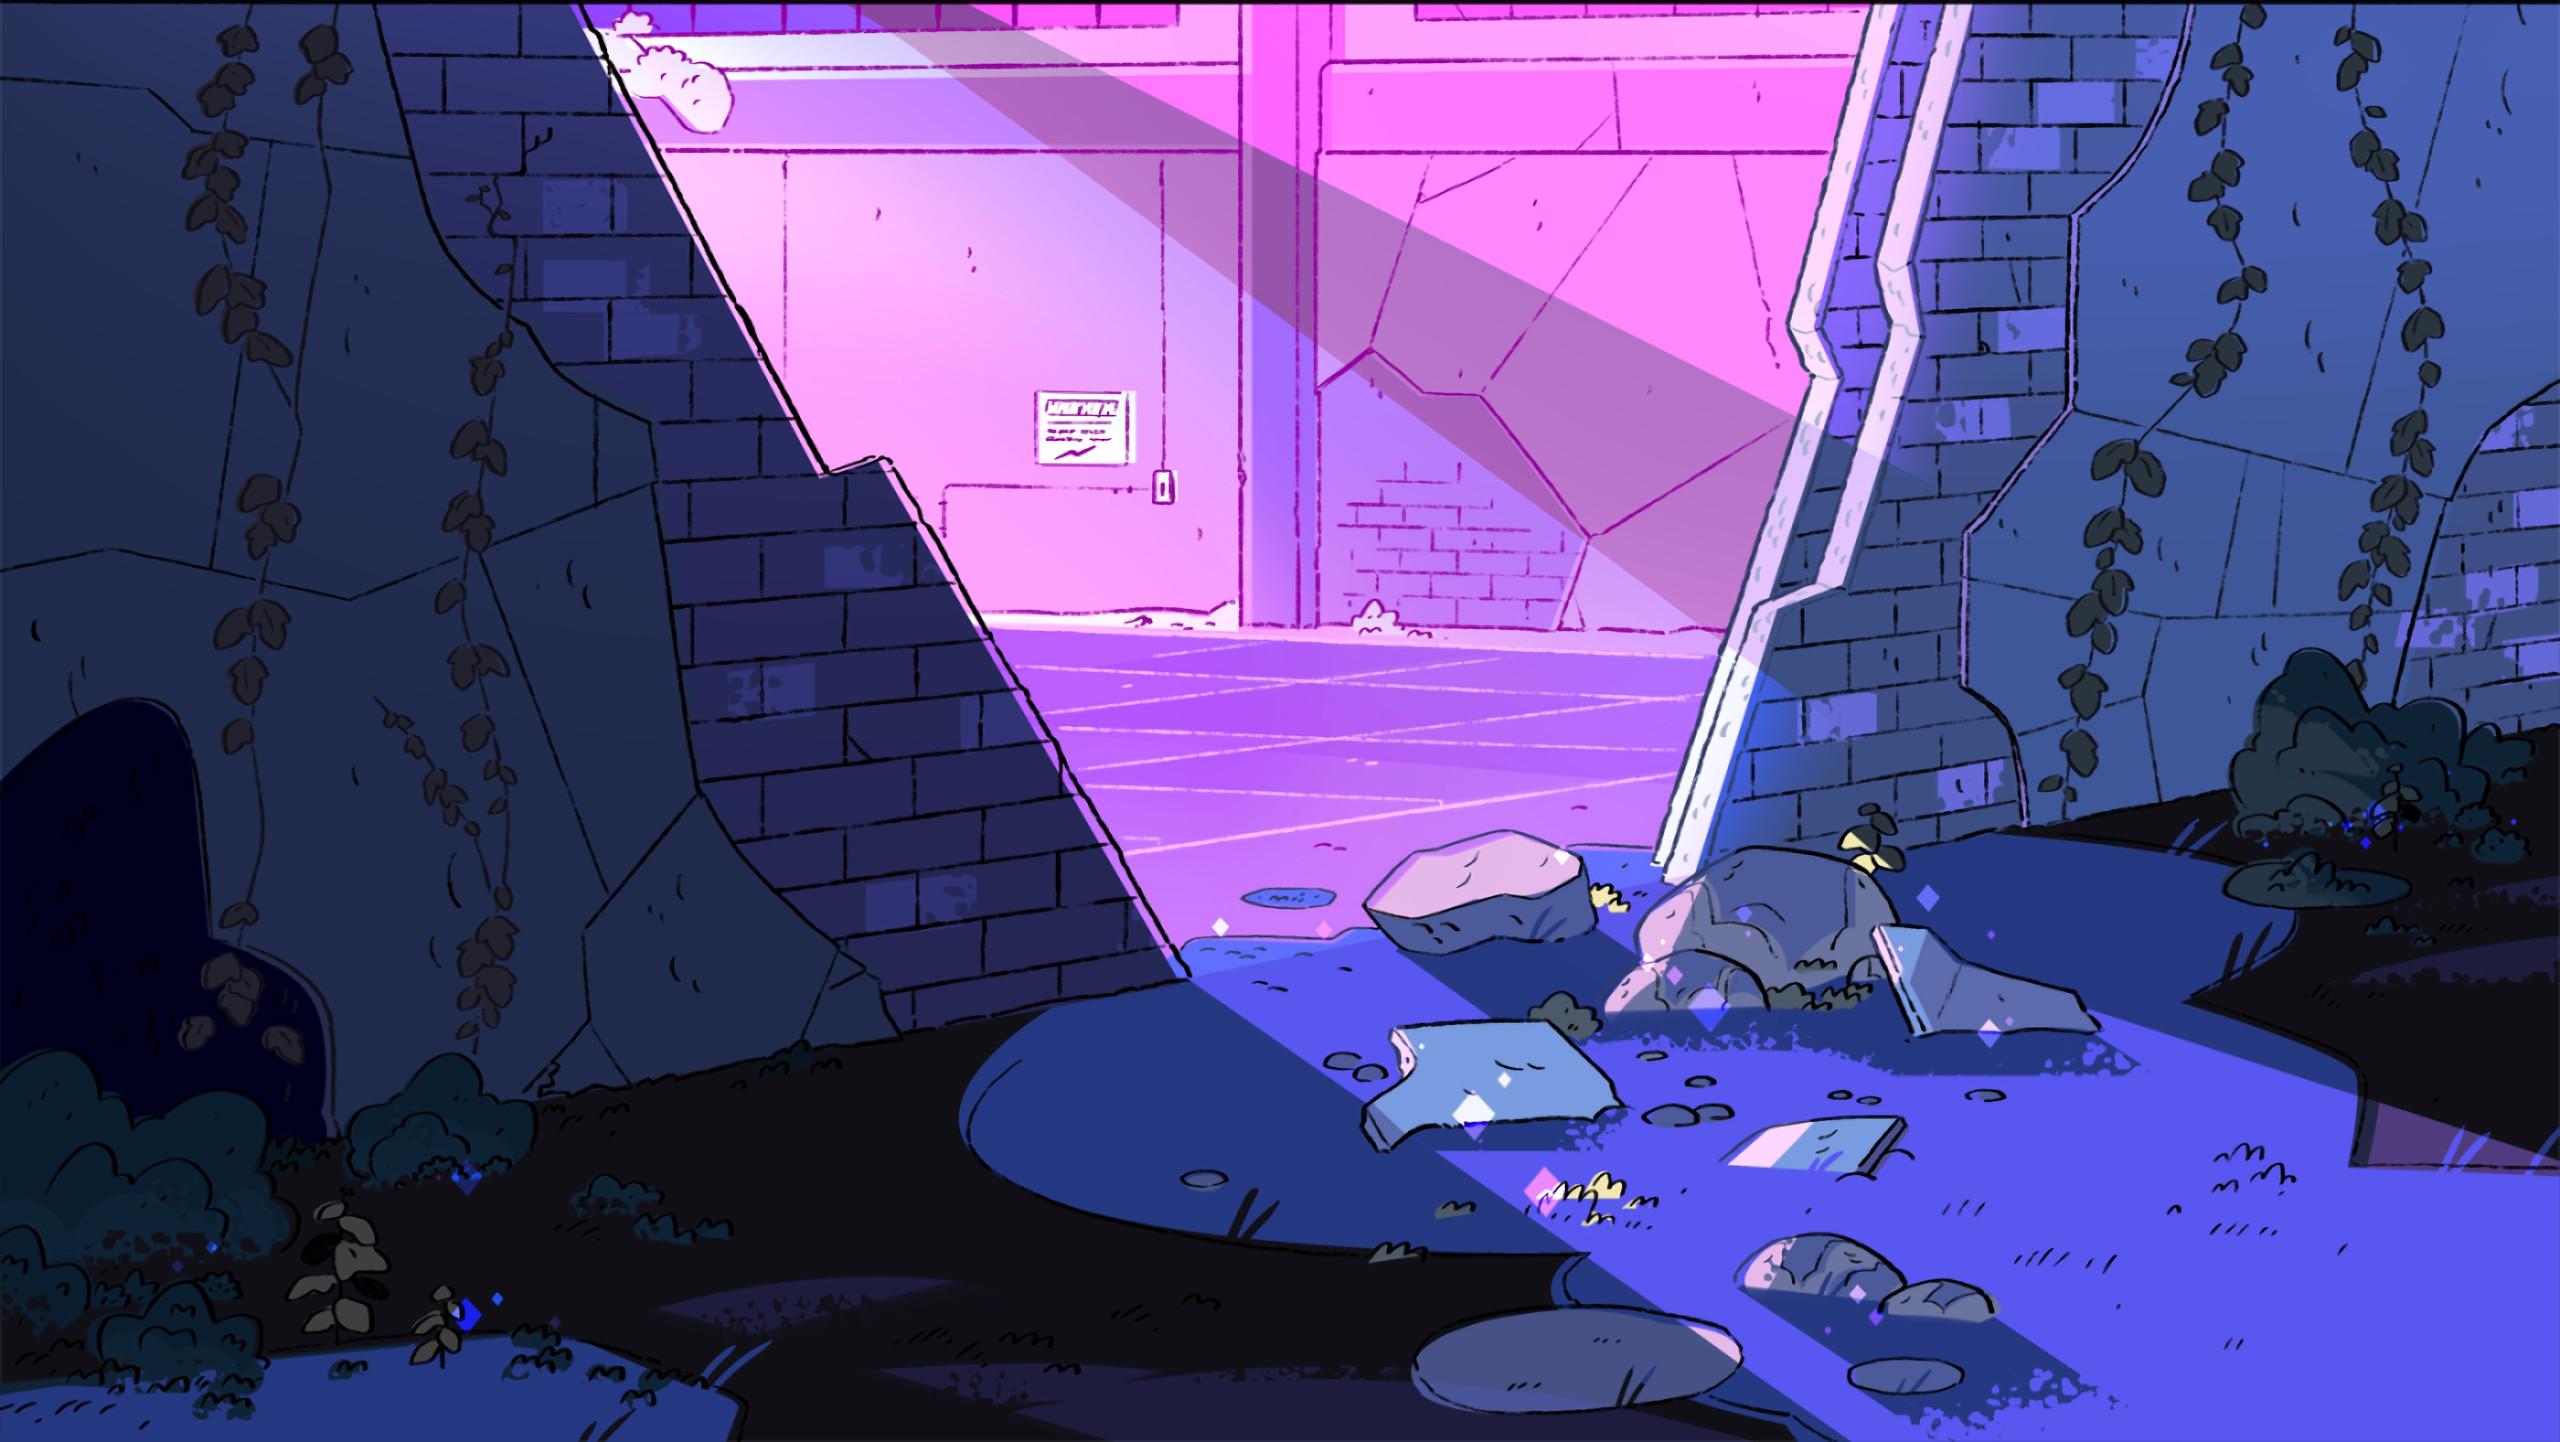 Steven Universe Desktop Wallpaper (74+ Images